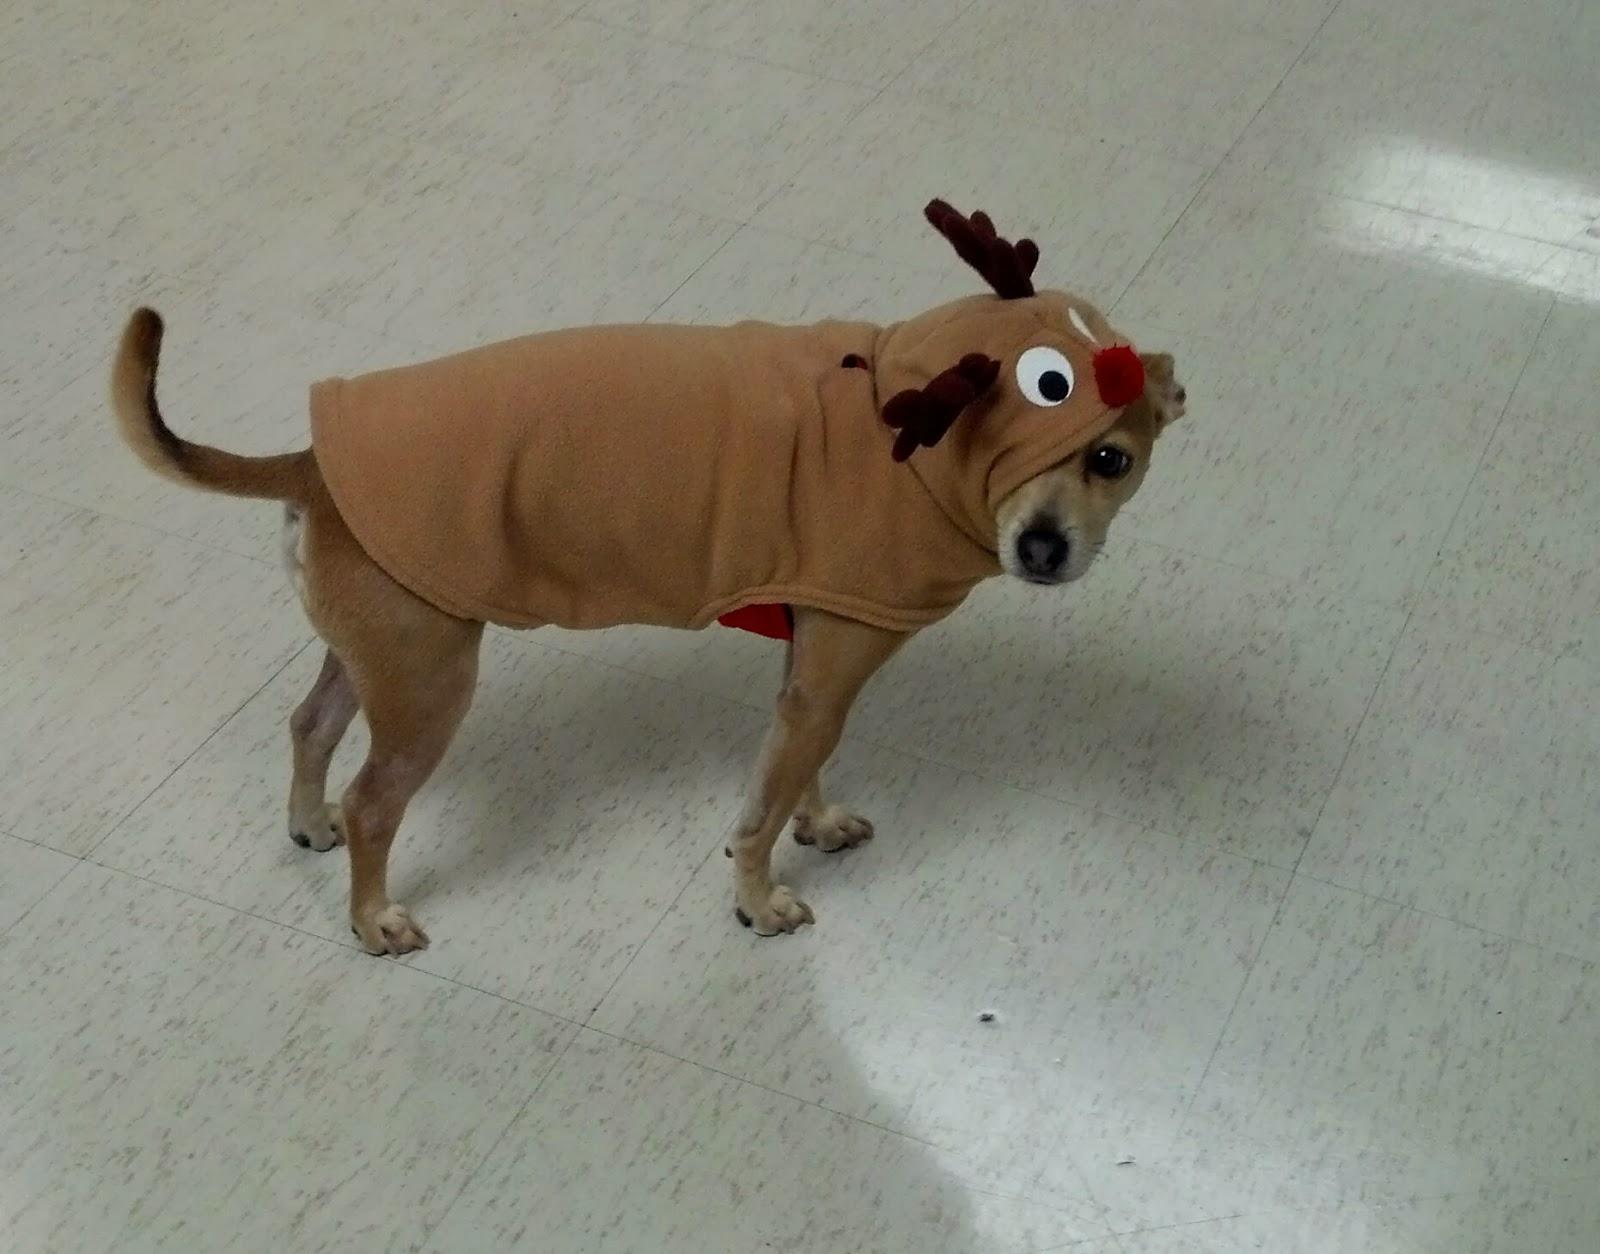 Real Santa And Rudolph Sightings - Viewing Gallery